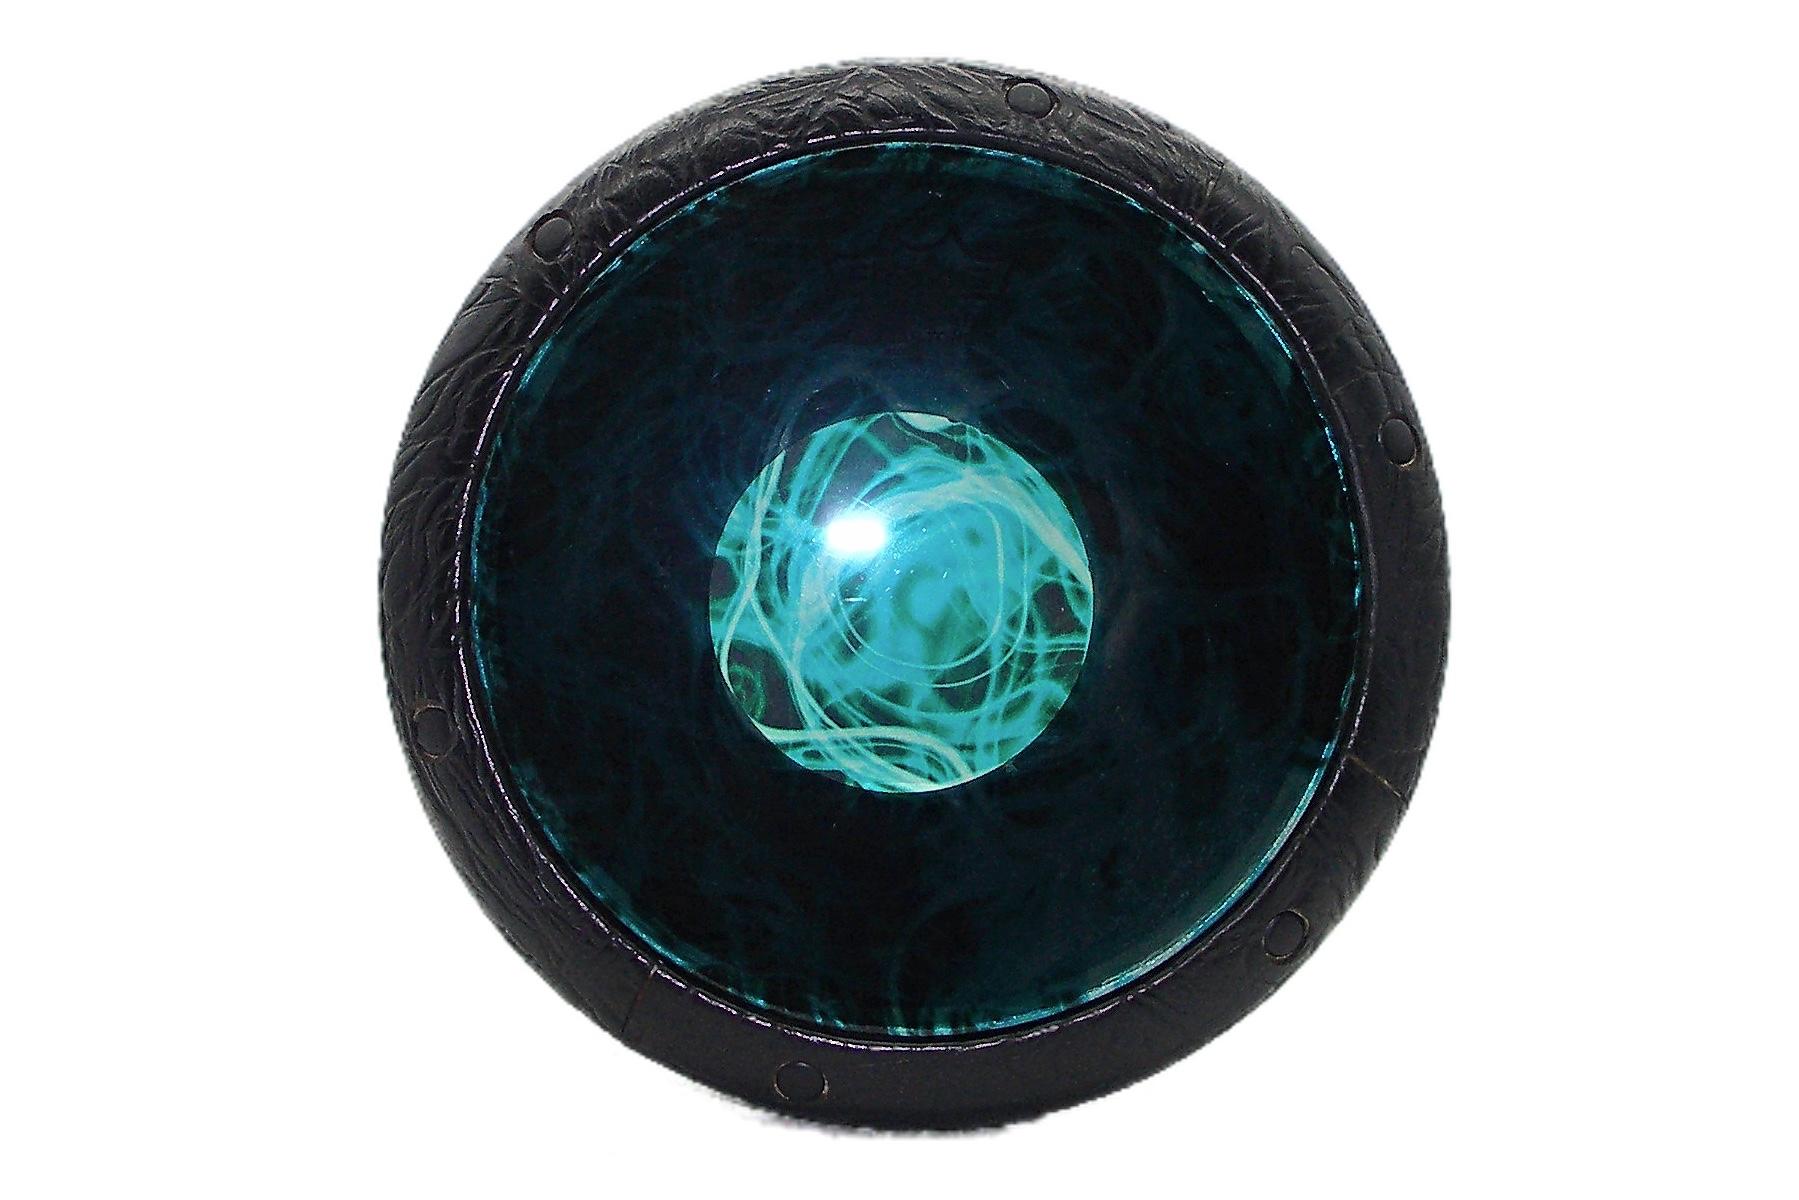 Egyptian-GEF-Black-Vinyl-Turquoise-Mist-Cleartone-Head-Darabuka